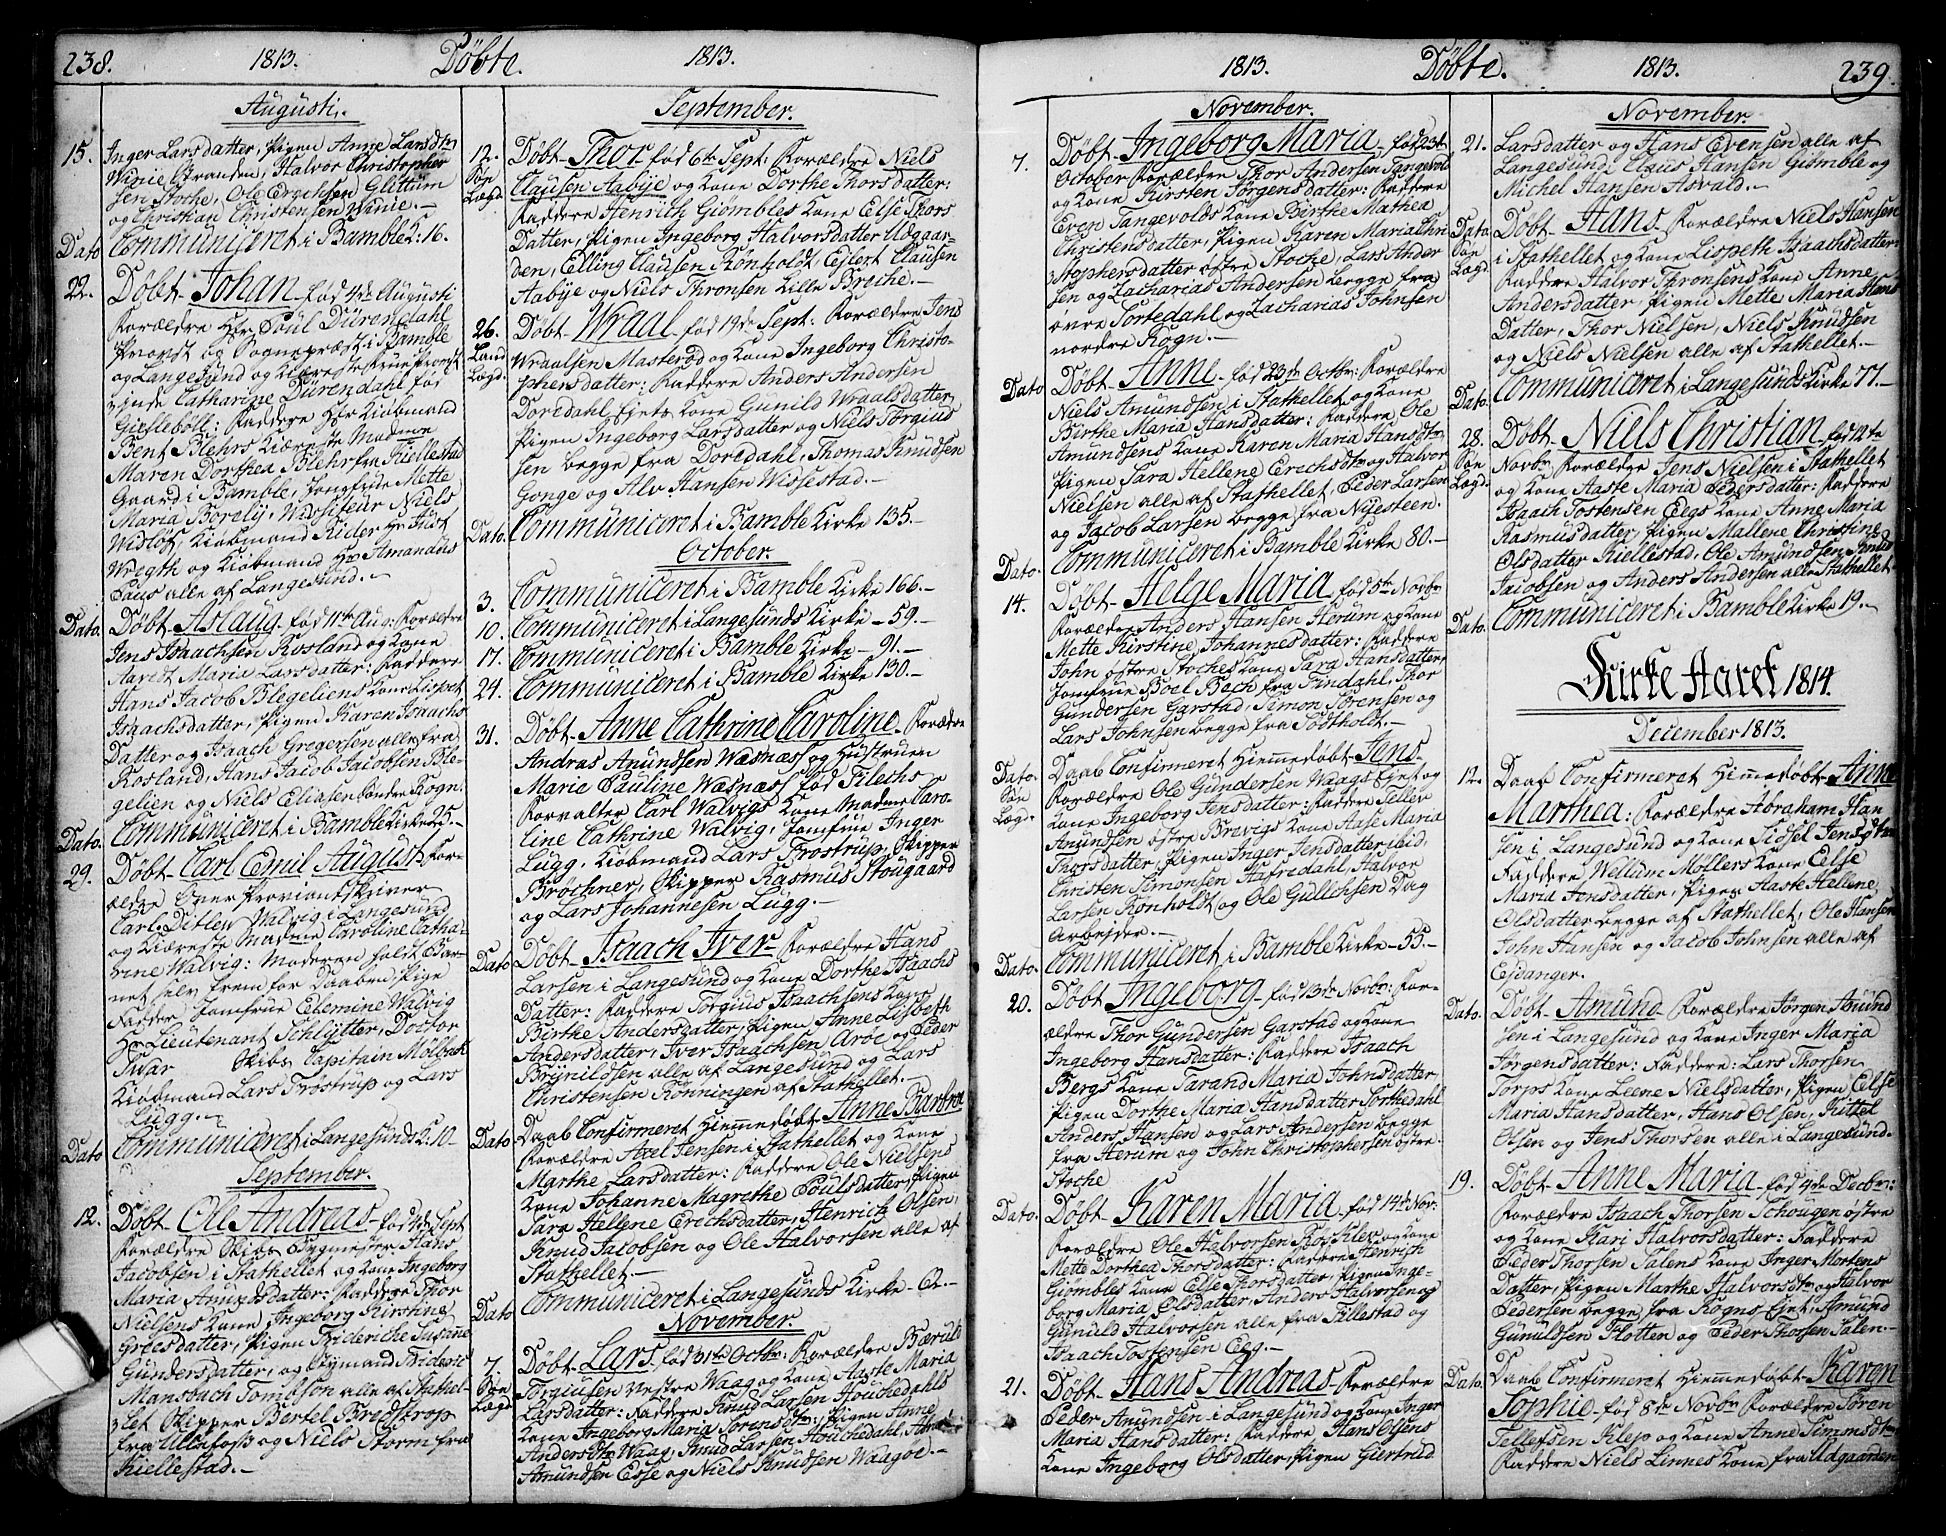 SAKO, Bamble kirkebøker, F/Fa/L0002: Ministerialbok nr. I 2, 1775-1814, s. 238-239